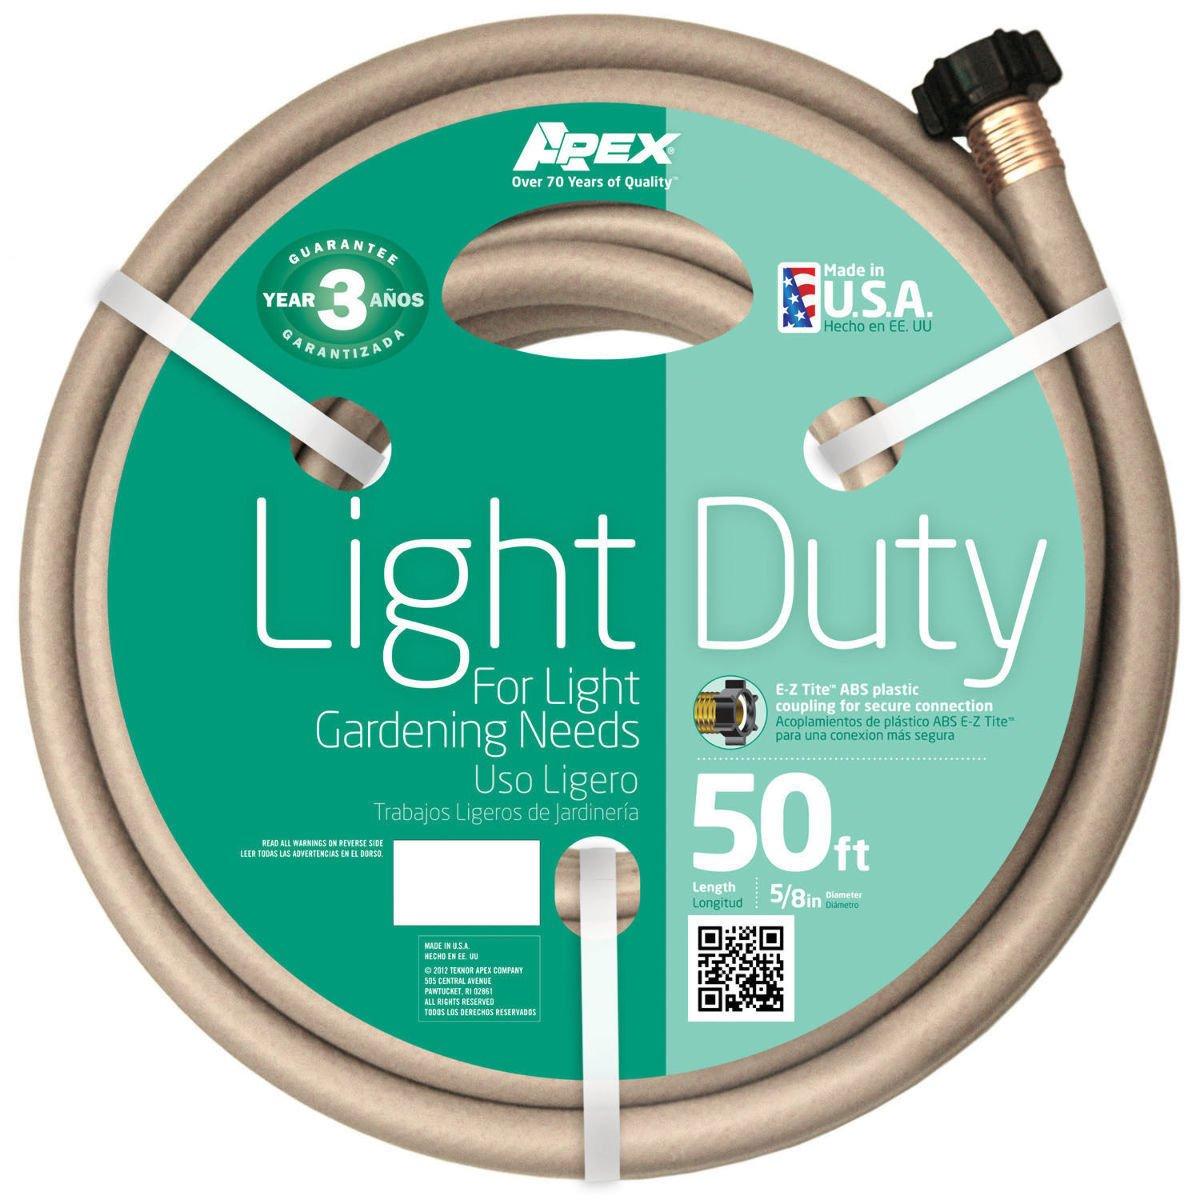 Green Thumb / Apex 8400-50 Light Duty 5/8'' X 50` Garden Hose W/ Ez Tite Coupling